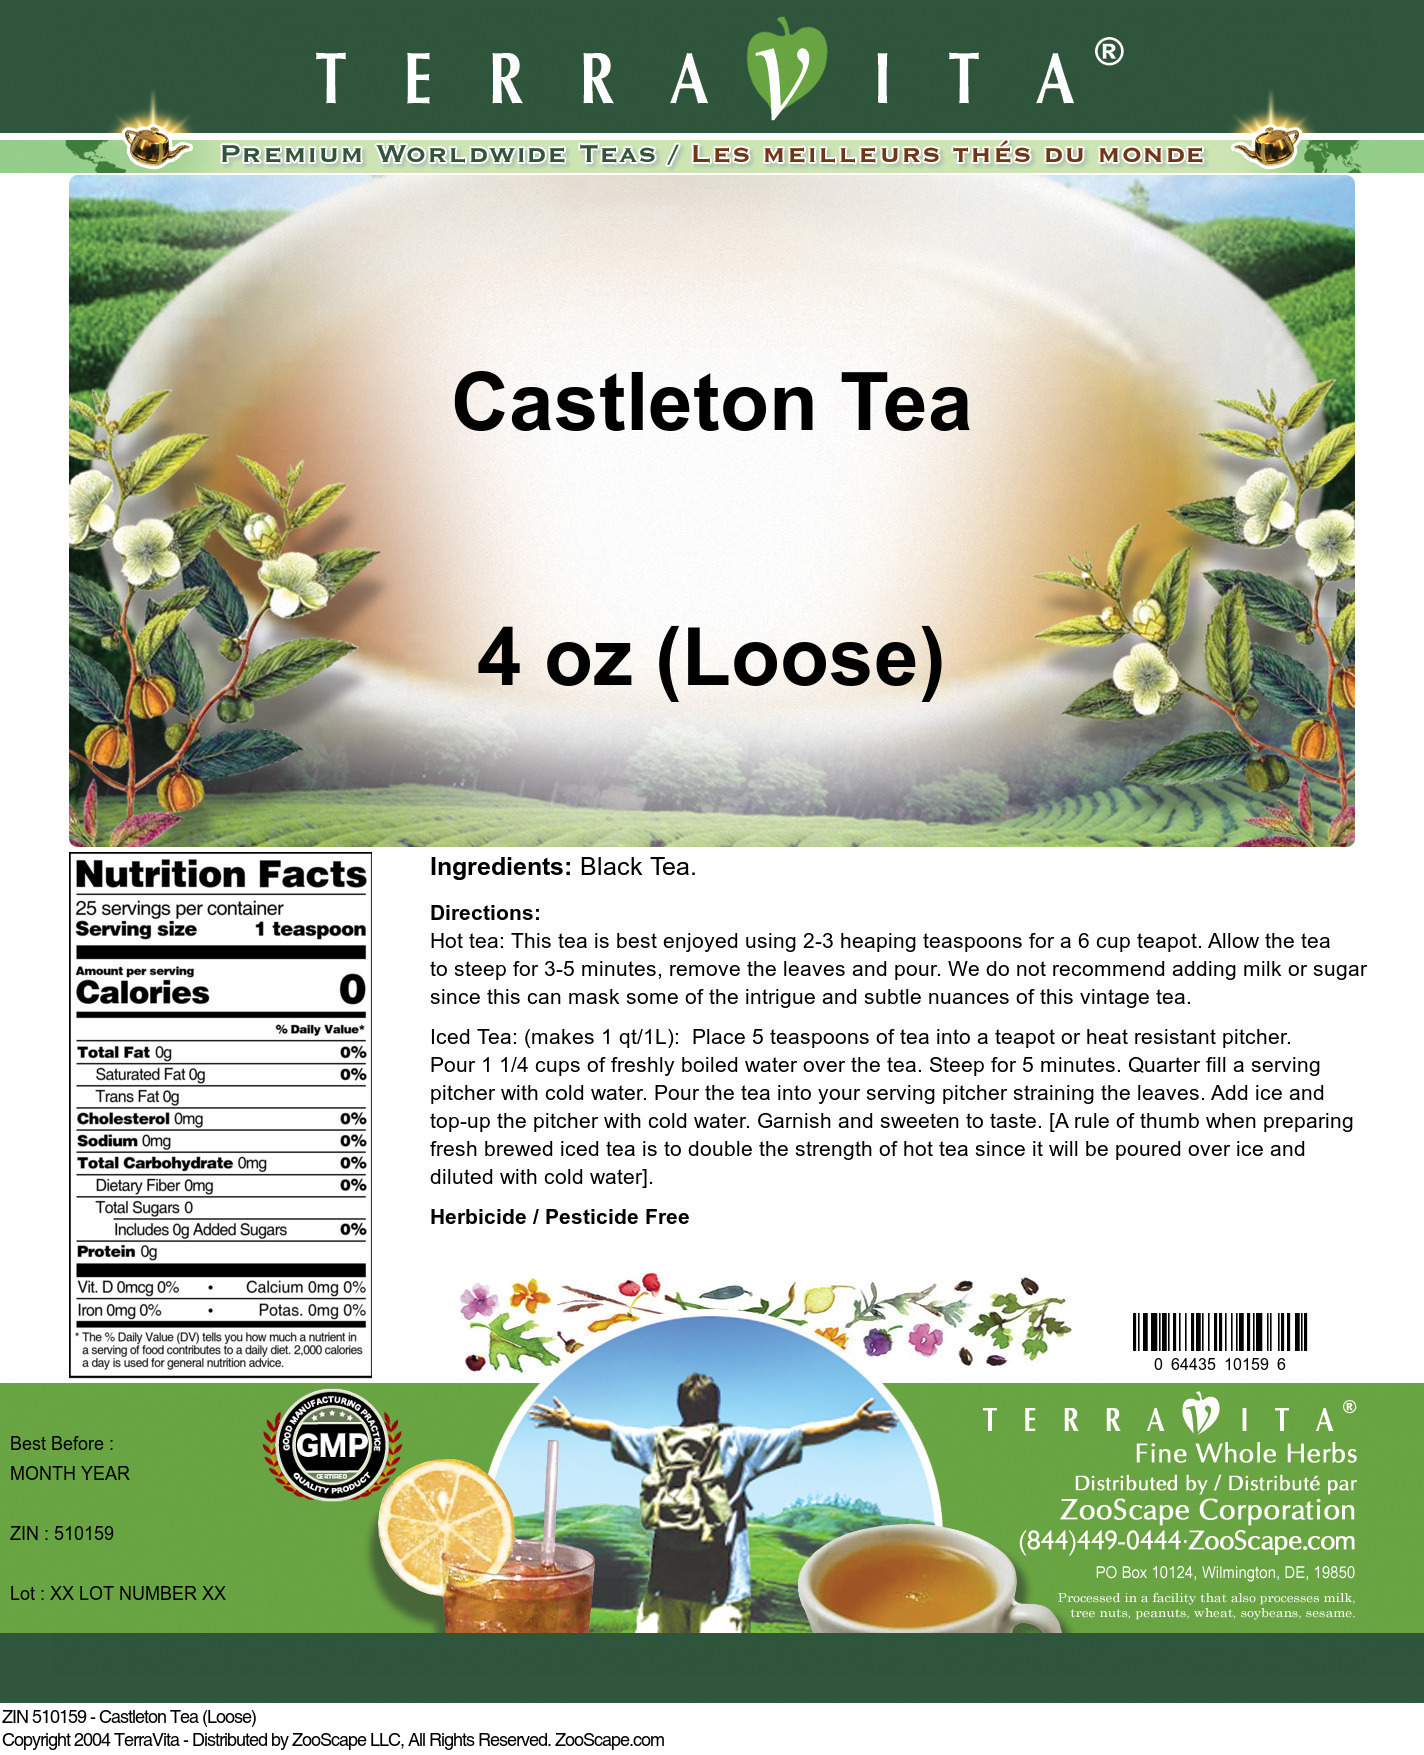 Castleton Tea (Loose)